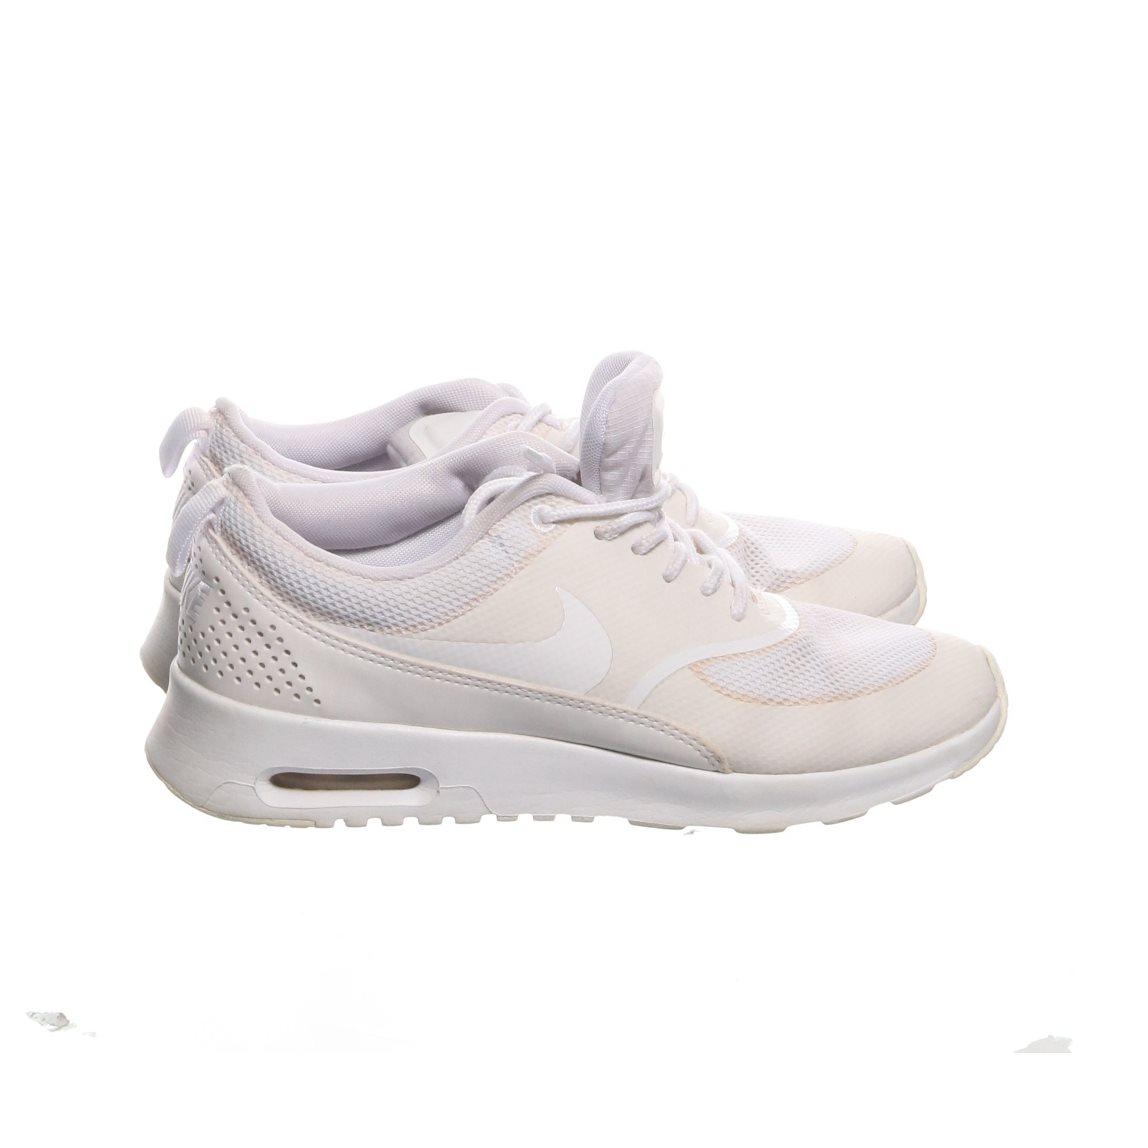 half off be9b8 7b7a1 Nike, Sneakers, Strl  37, air max, Vit